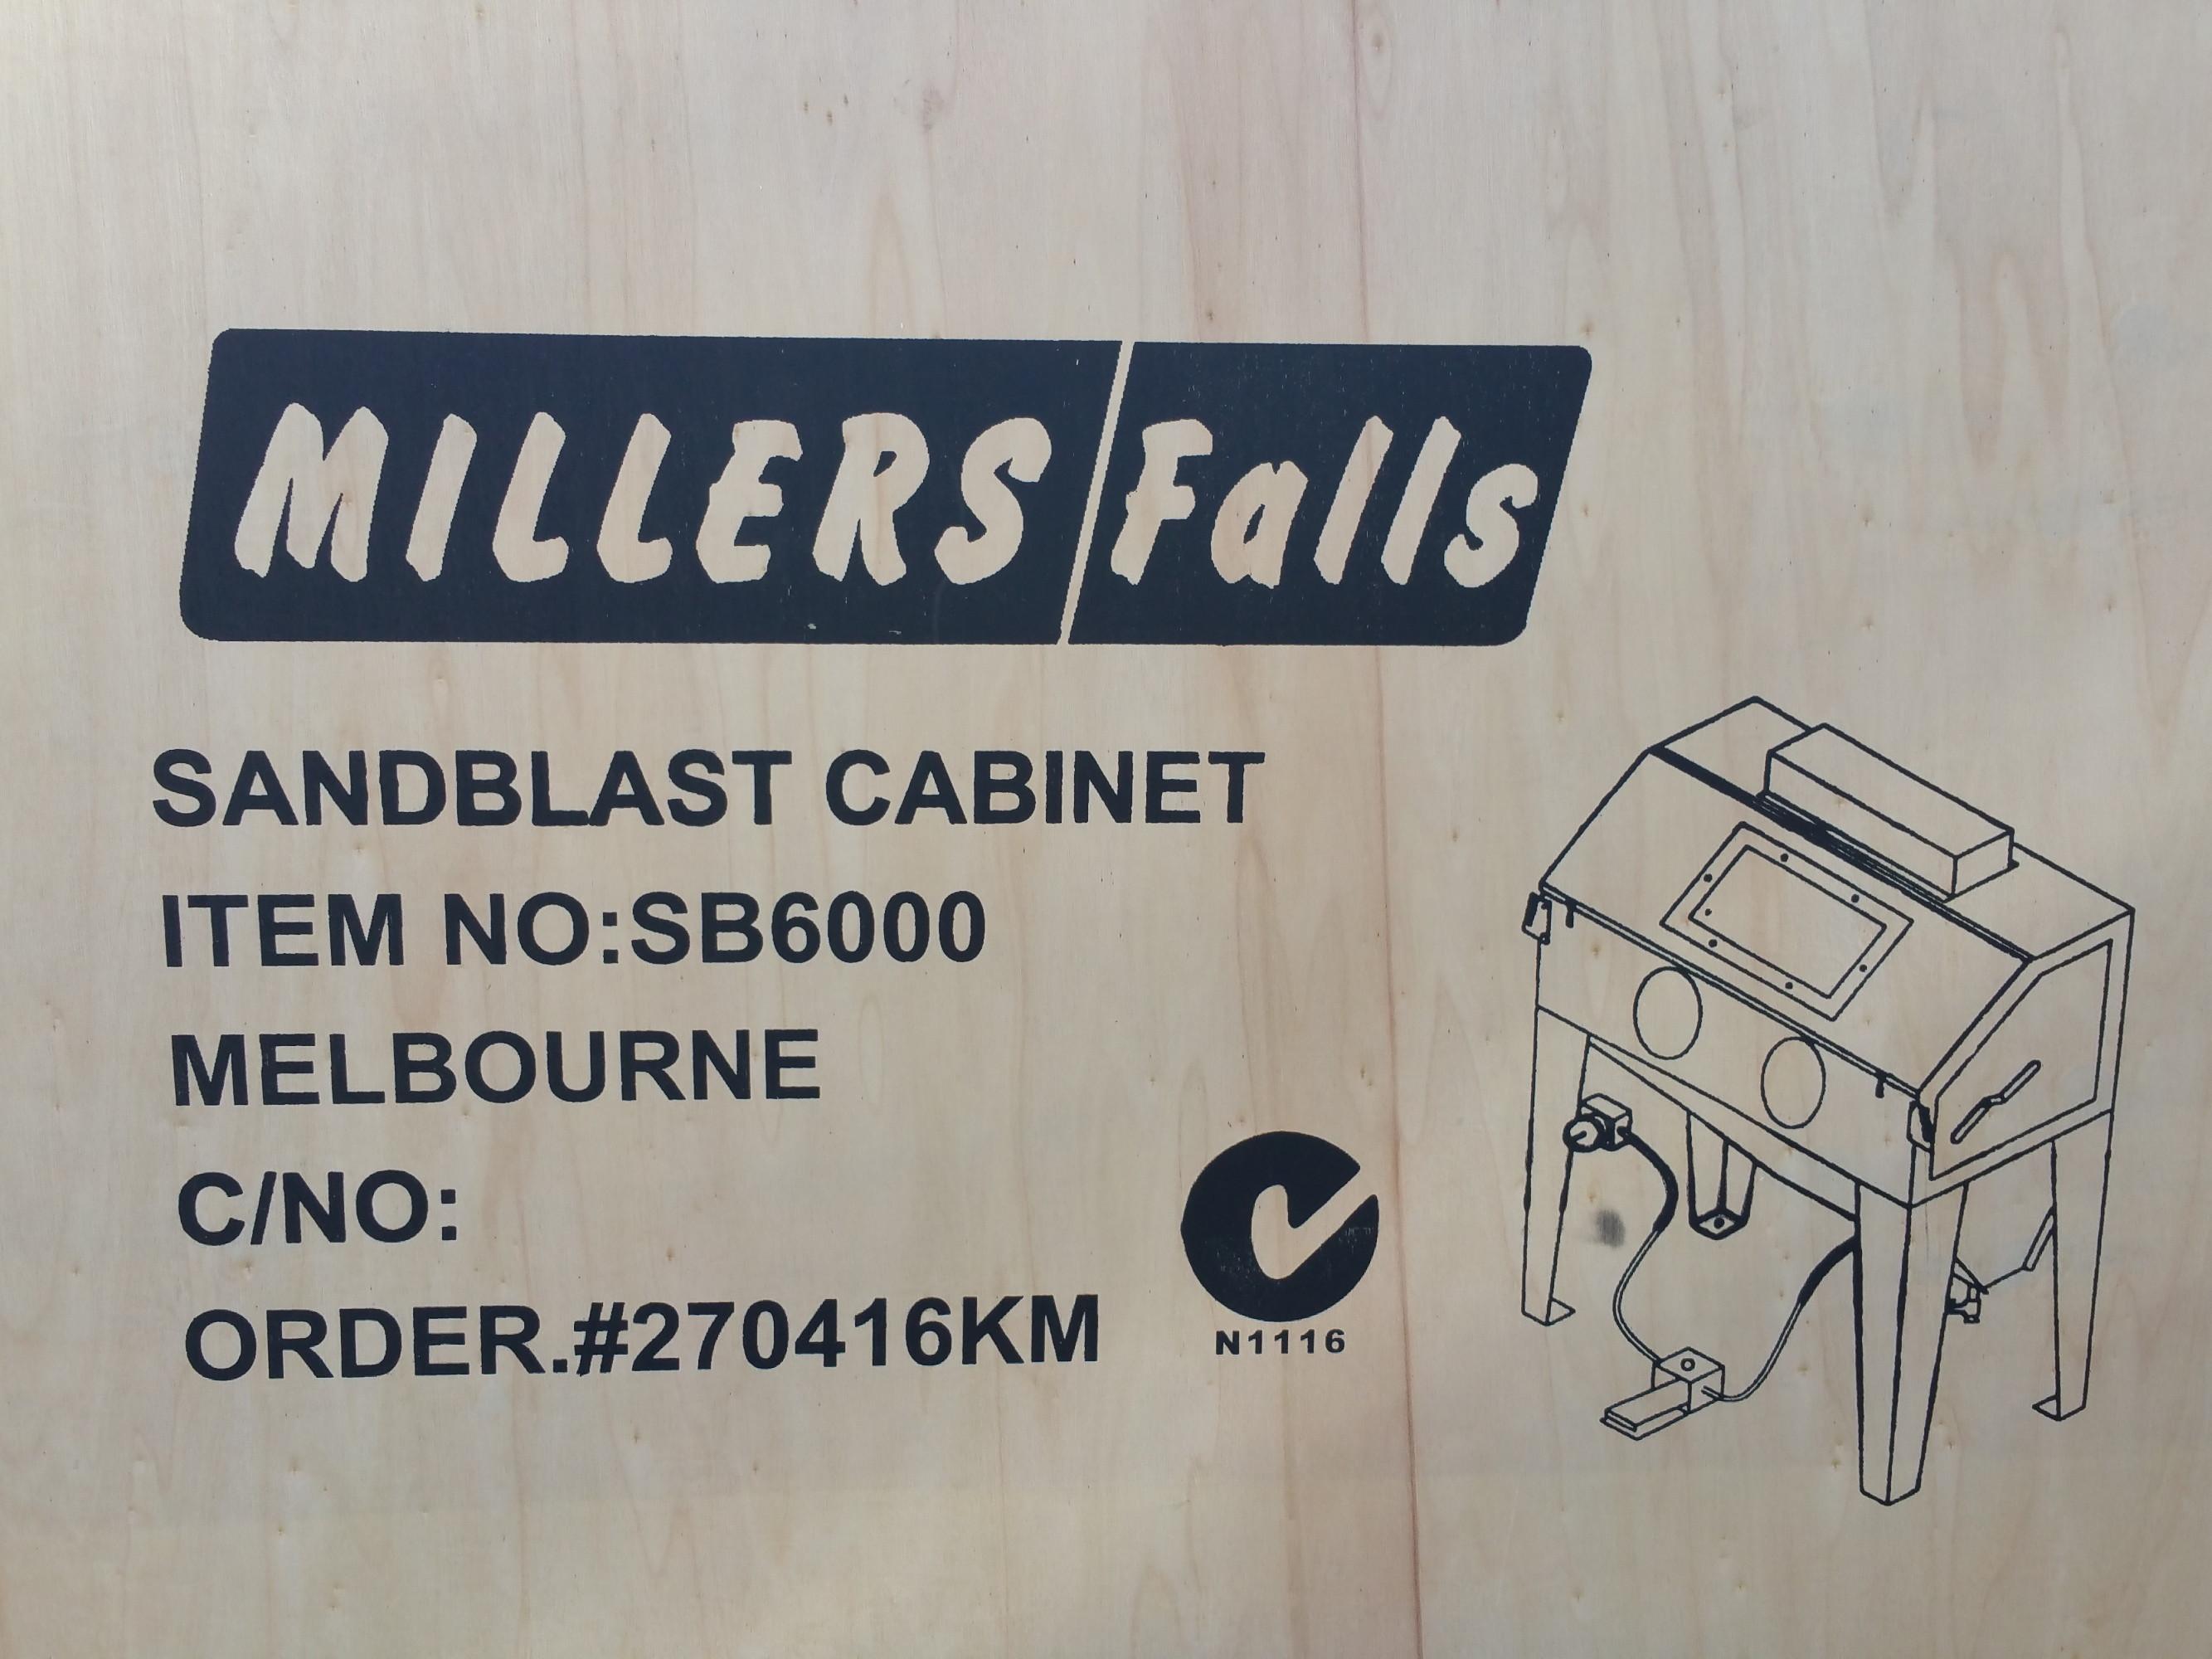 TWM 420 Litre sand blasting cabinet